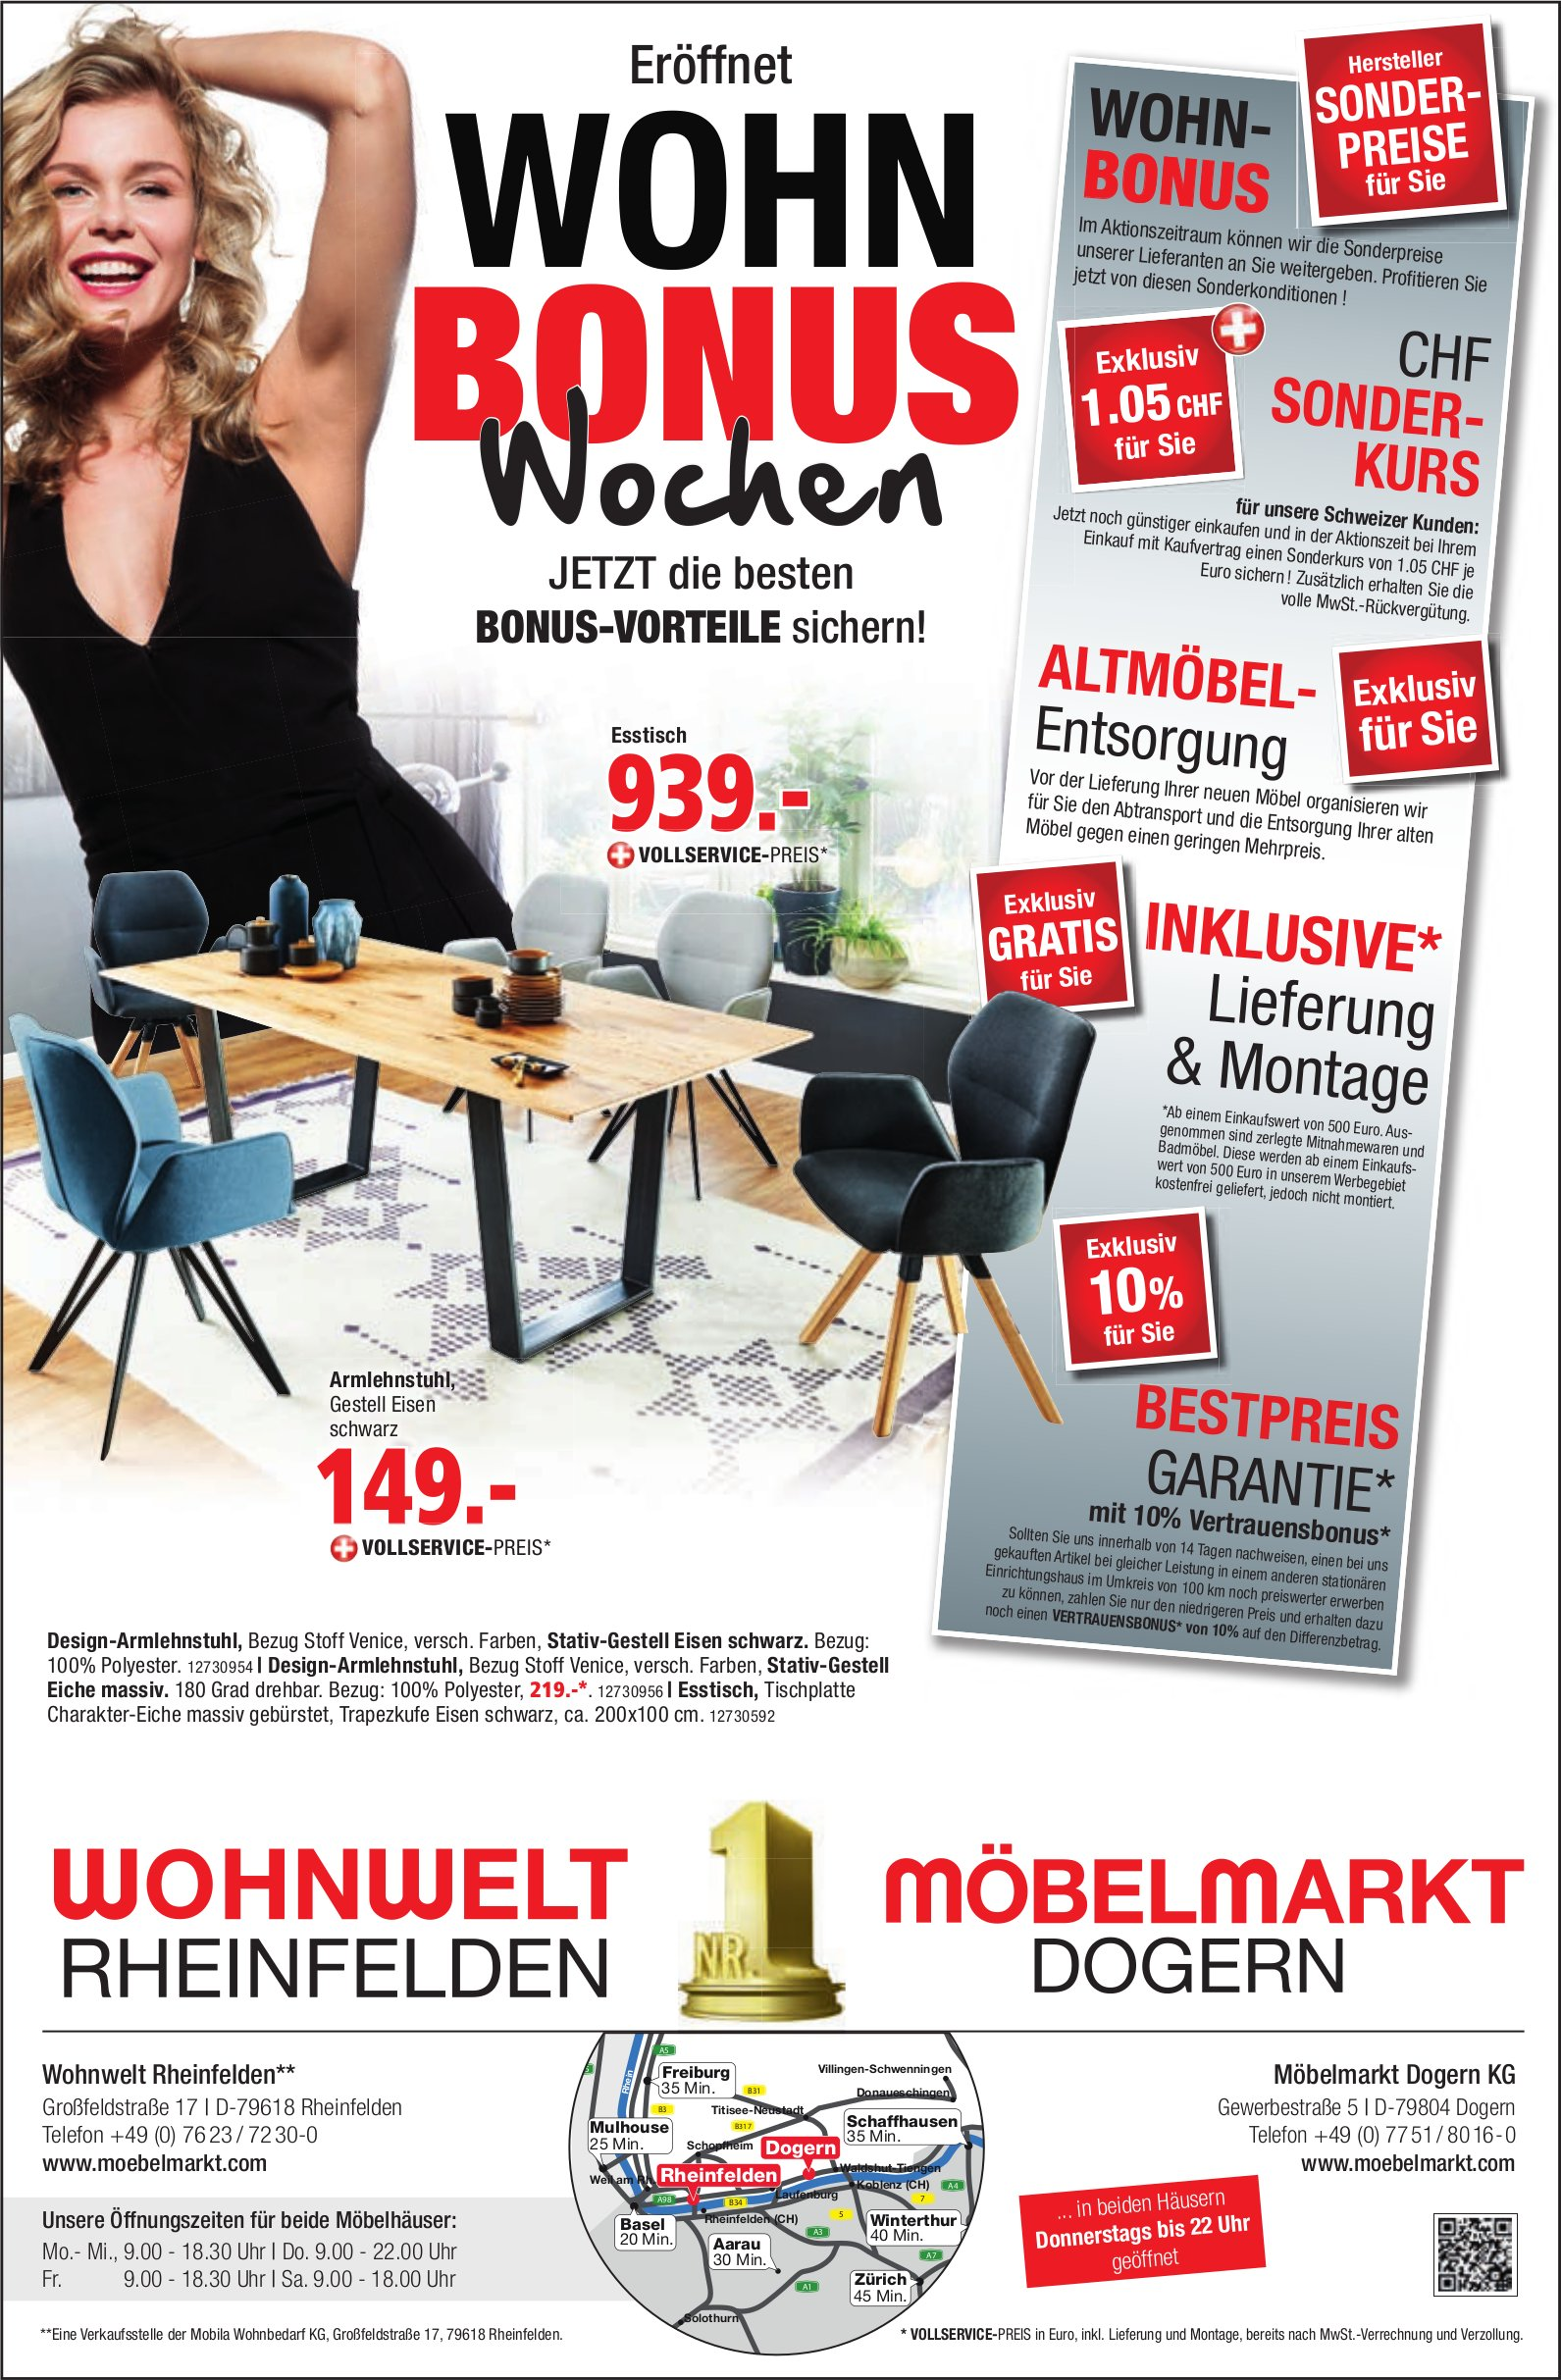 Wohnwelt, Rheinfelden - Wohn Bonus Wochen